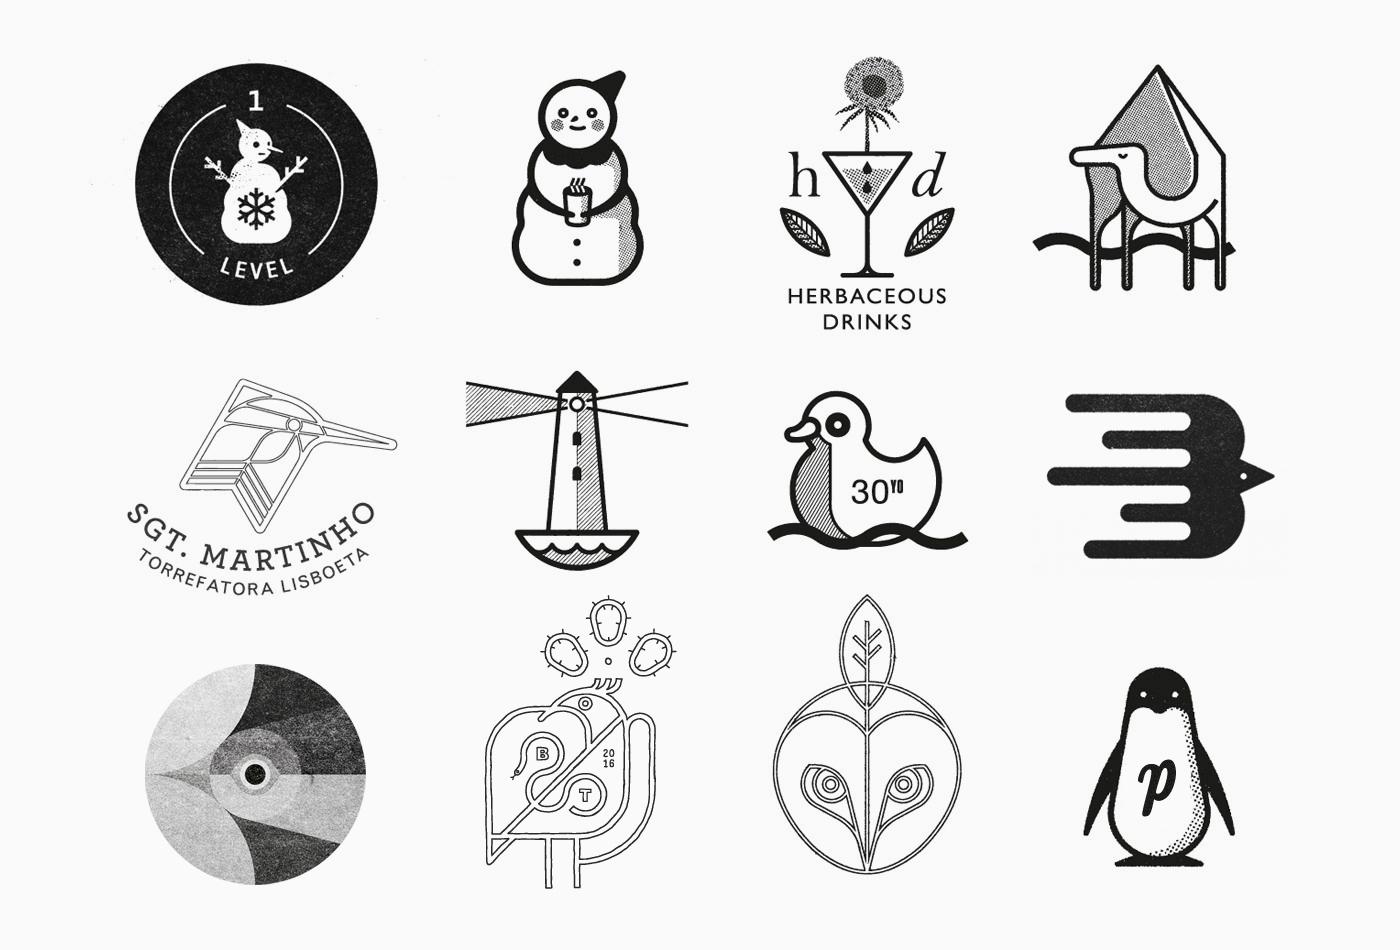 mark-logo-logos-logotype-brand-branding-pittogramma-vacaliebres-marks-pictogram-sign